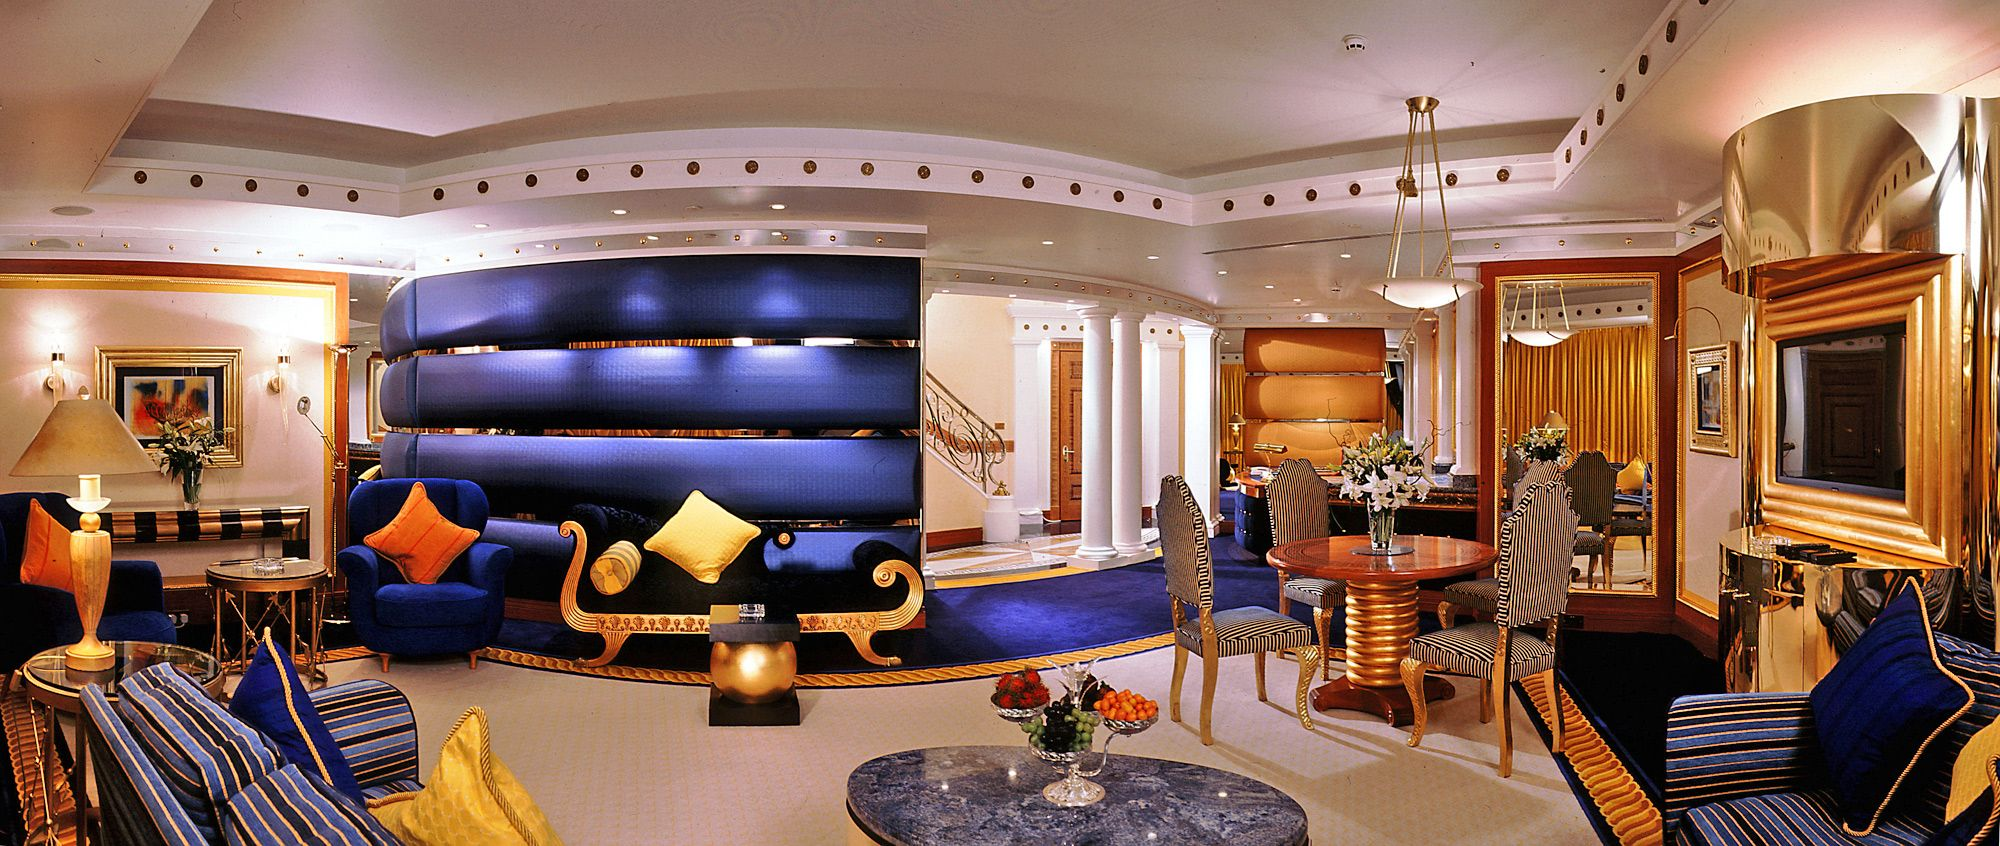 Burj Al Arab The World S Only 7 Star Hotel Luxury Hotels Burj